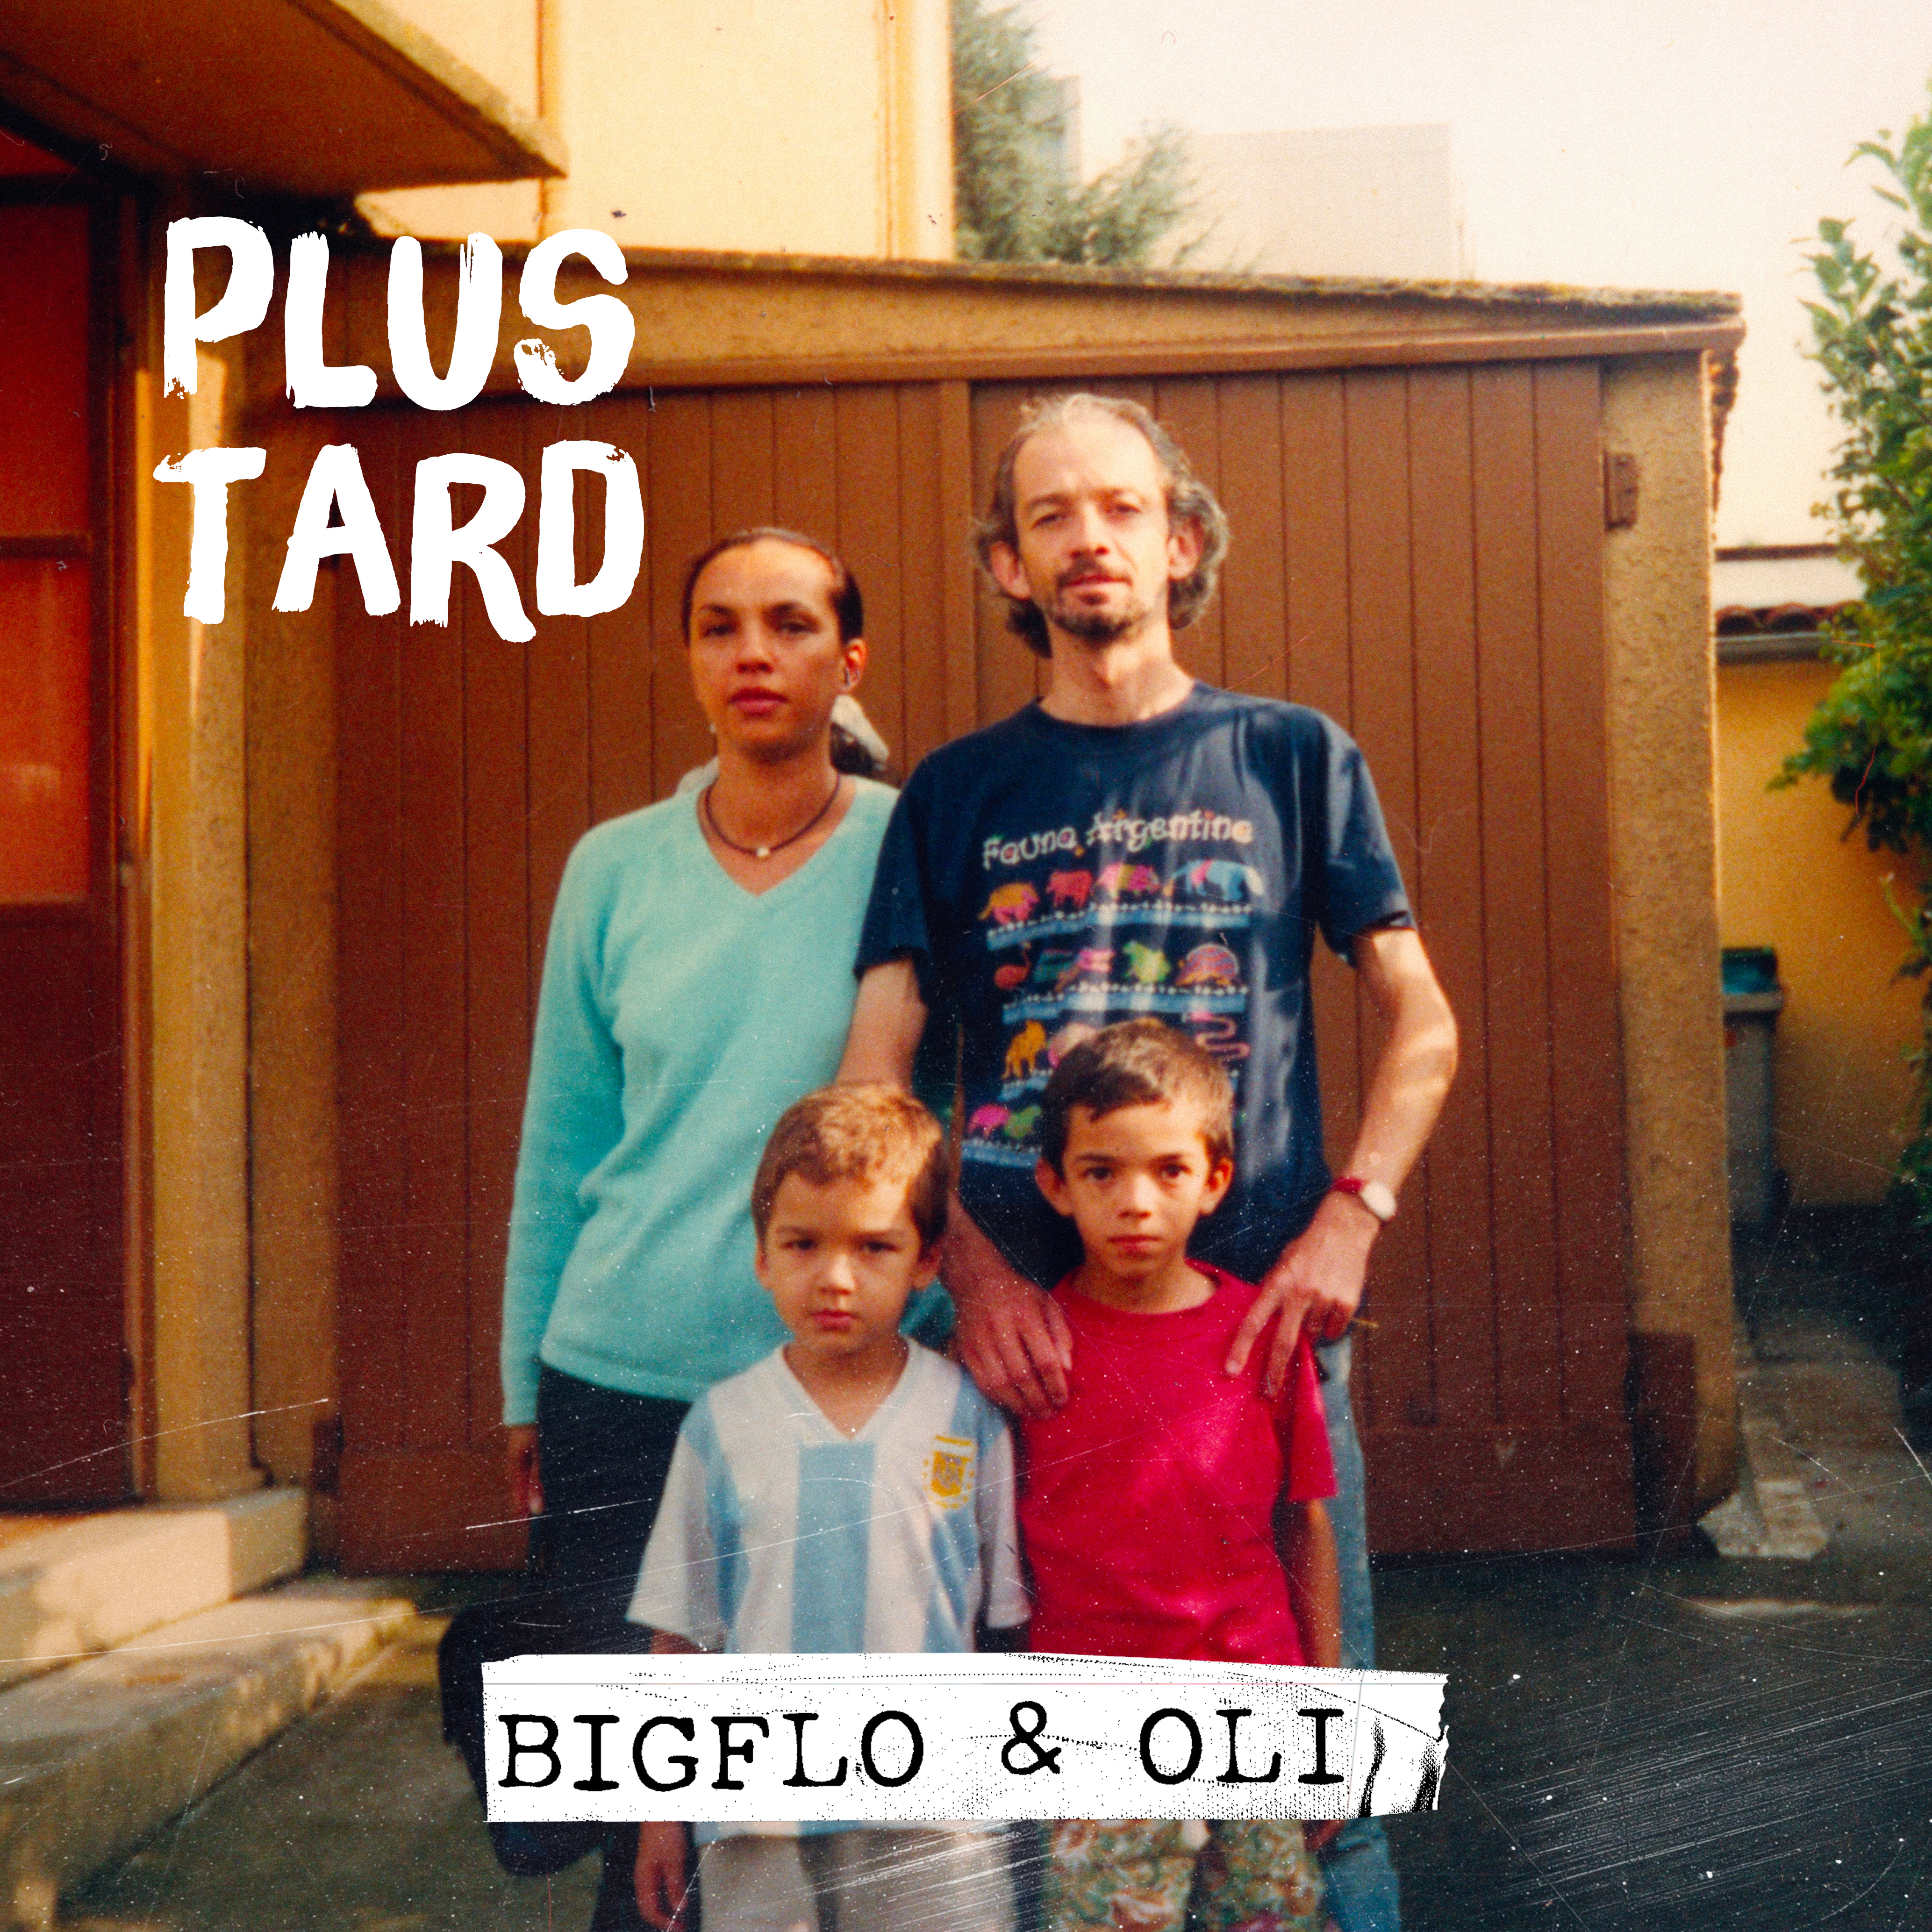 Bigflo & Oli - Plus tard